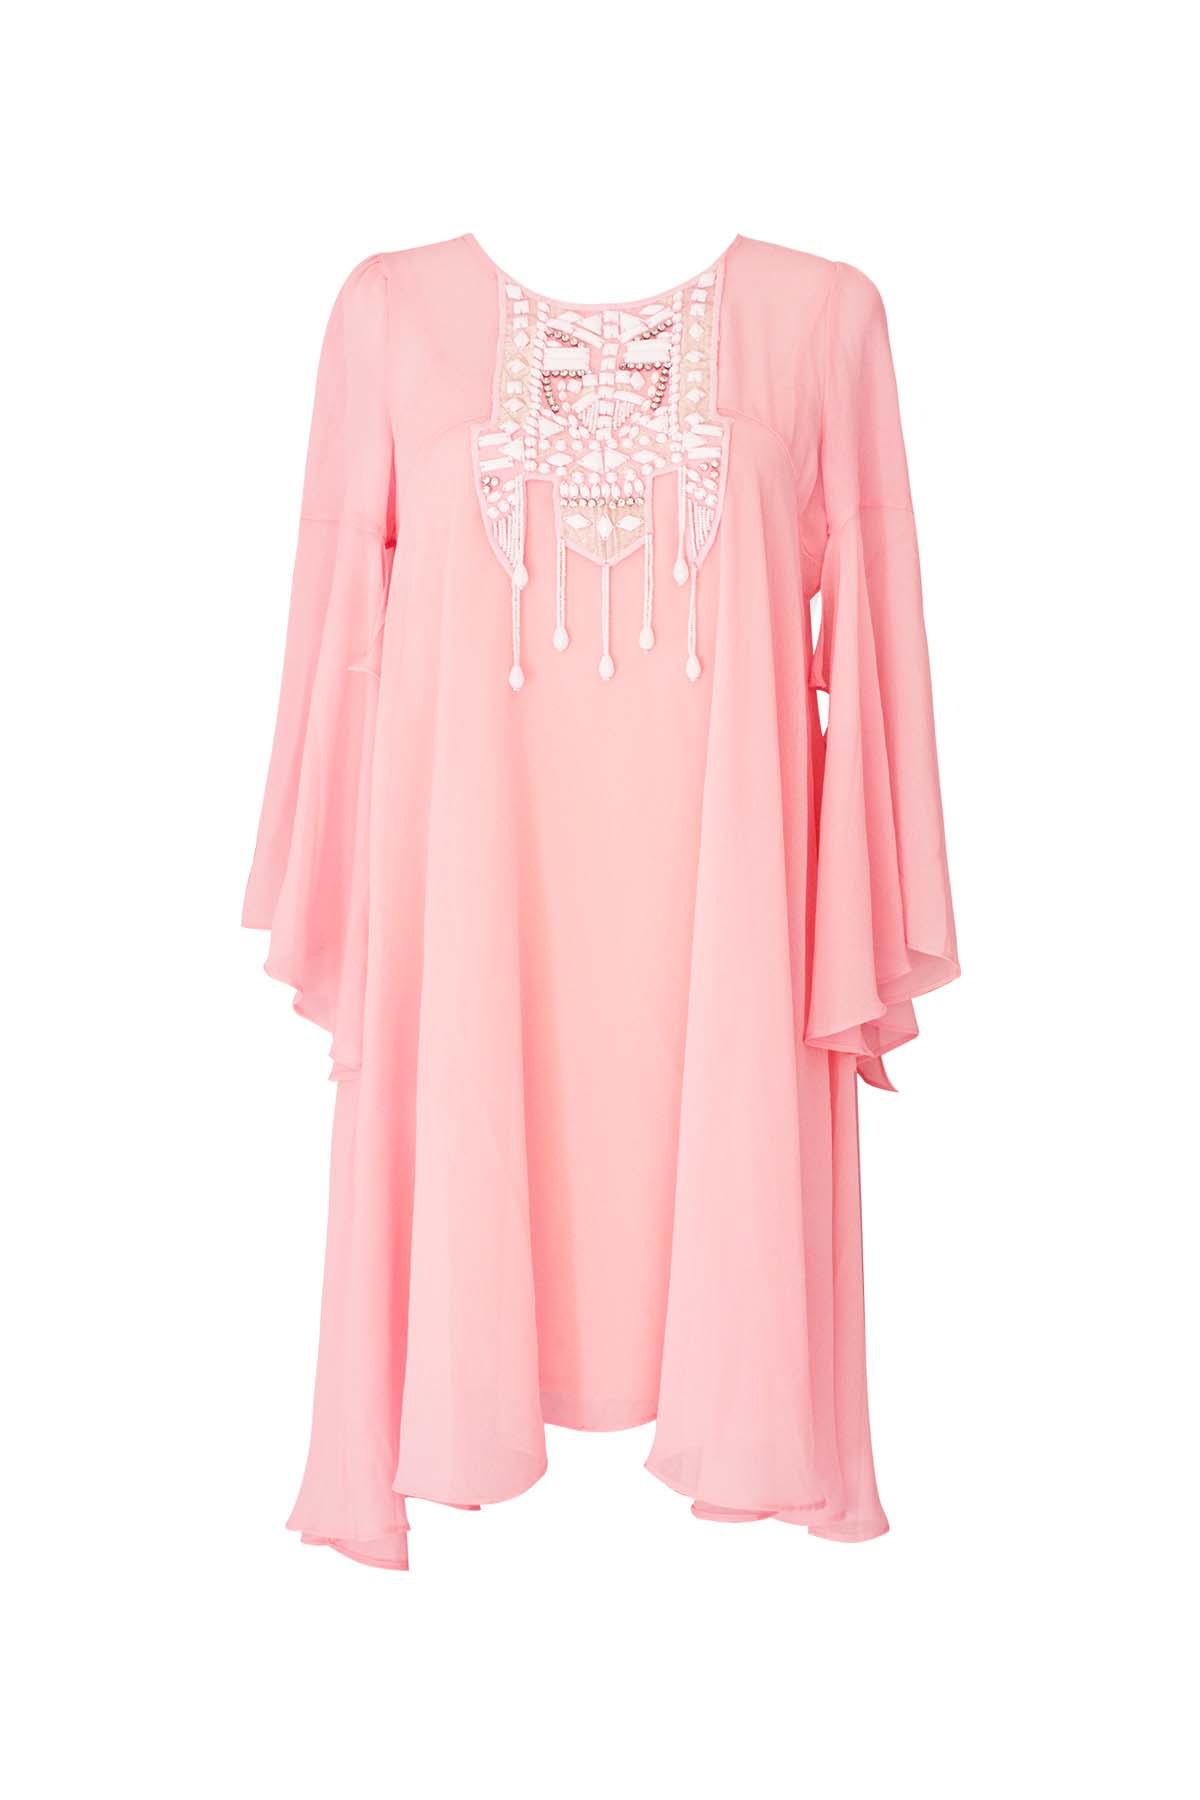 Teria Yabar - Vestido Kaftán rosa